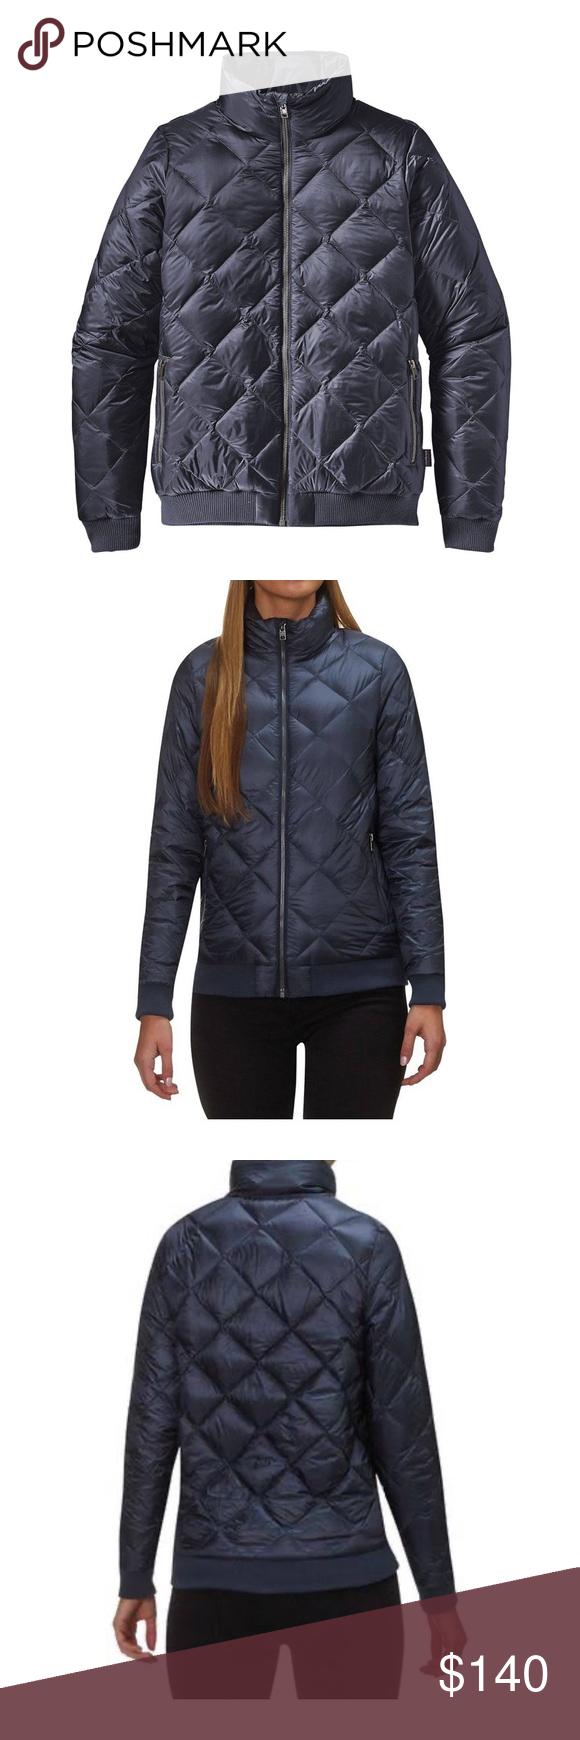 Nwot Patagonia Bomber Jacket Size Small Jackets Bomber Jacket Patagonia Womens [ 1740 x 580 Pixel ]